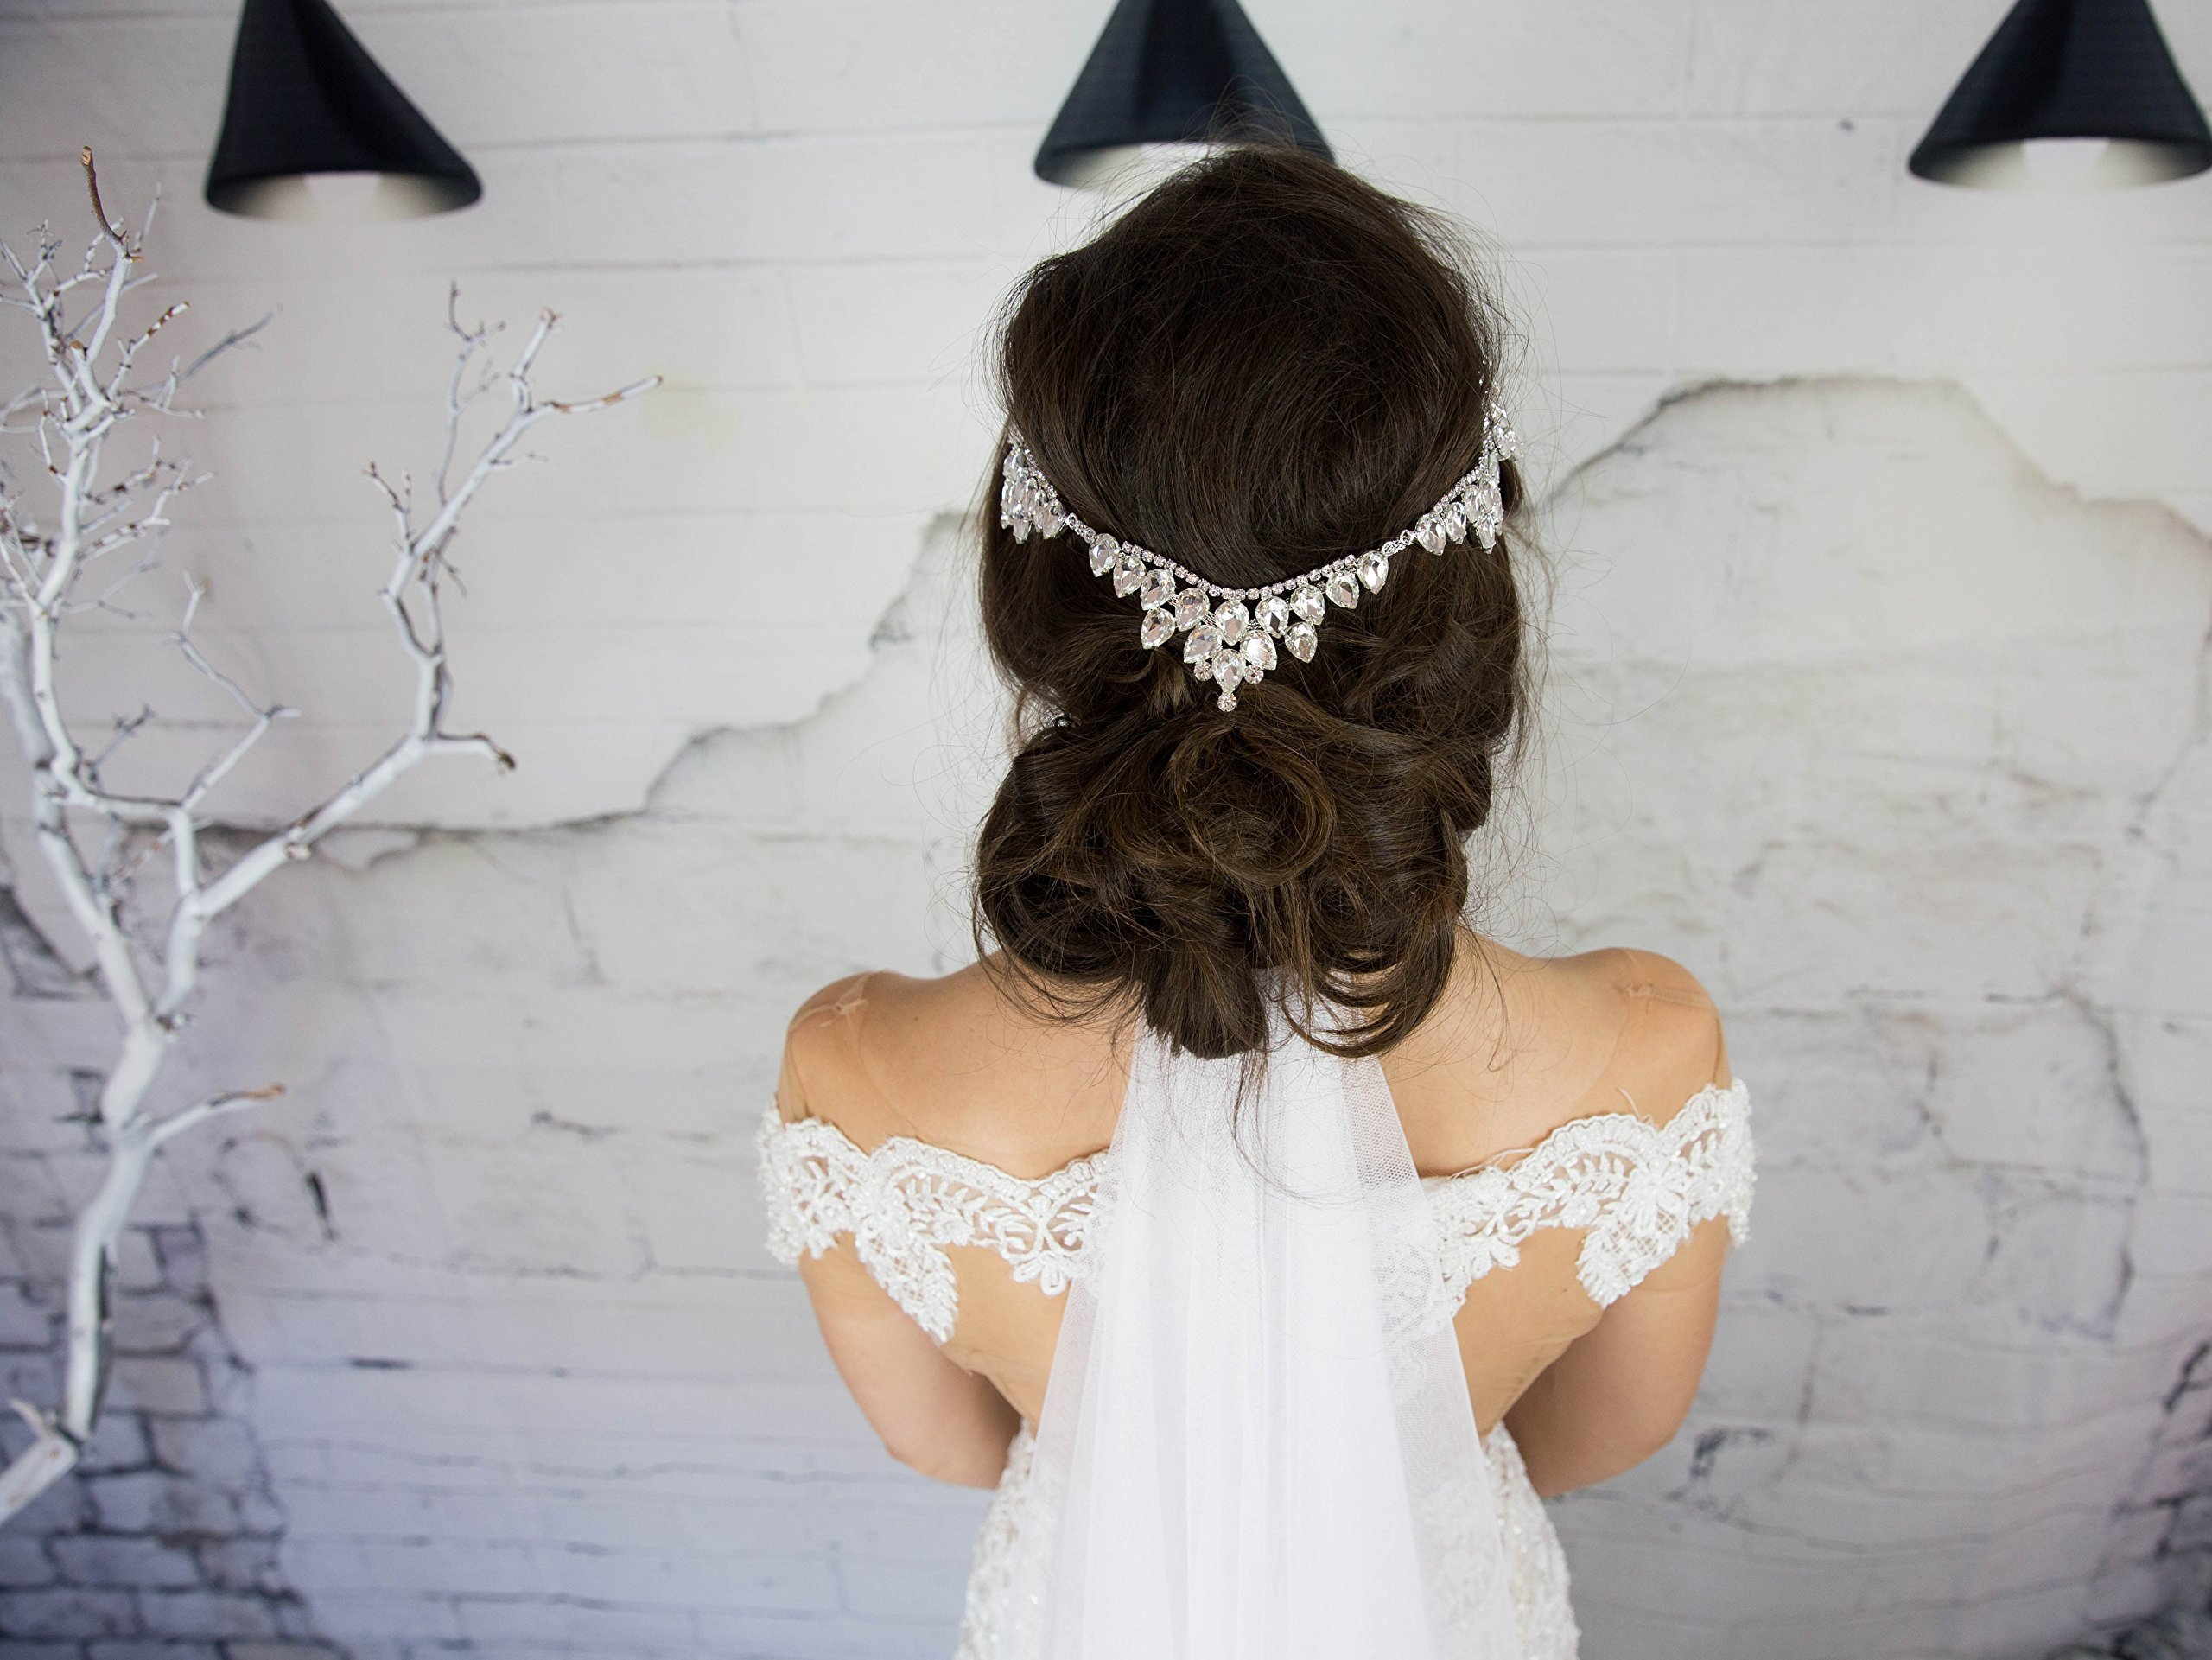 Crystal Bridal Head Chain, Goddess Headpiece, Wedding Hair Accessories, Glam Hair Jewelry, Designer Headband